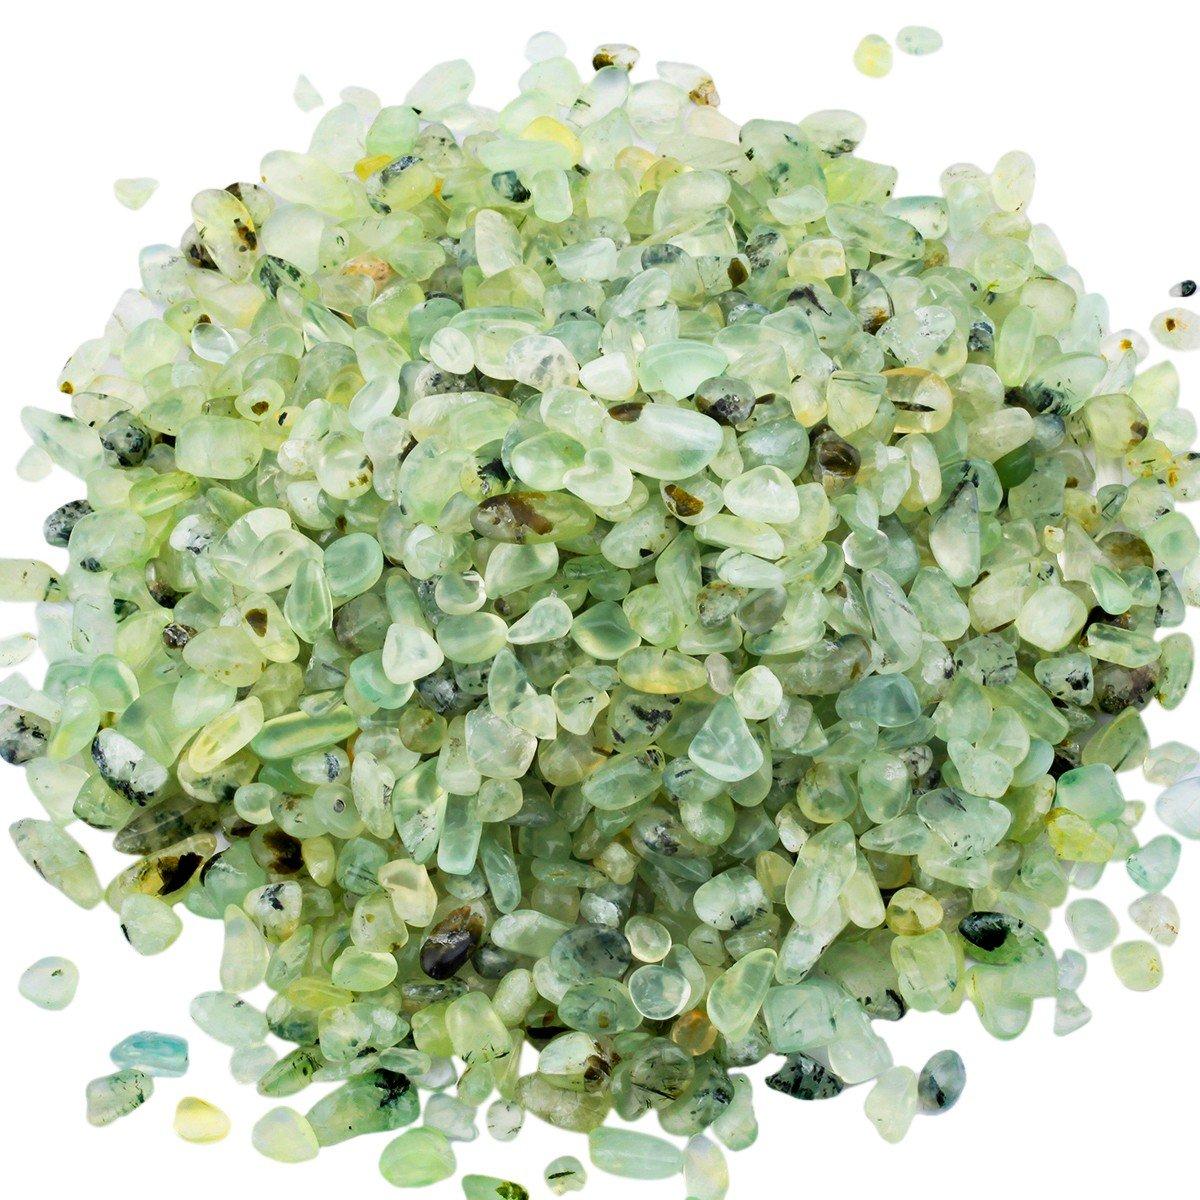 mookaitedecor 1 lb Tumbled Chip Stones Crushed Tumblestone Crystals Healing Home Decoration,Green Prehnite